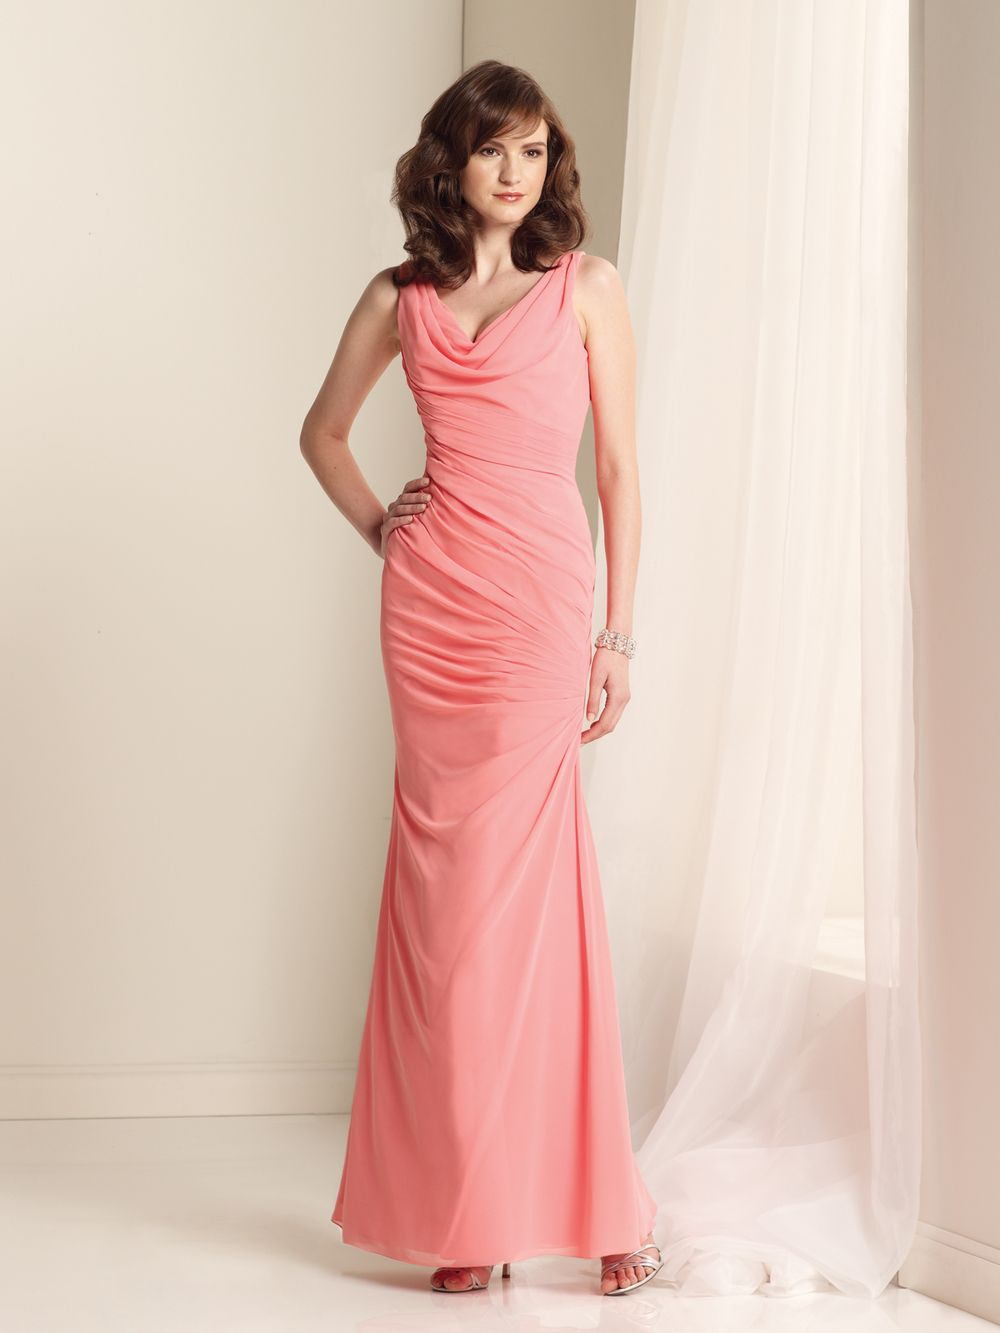 Elegant-Chiffon-Coral-Bridesmaid-Dresses-Floor-Length-Sheath | Coral ...